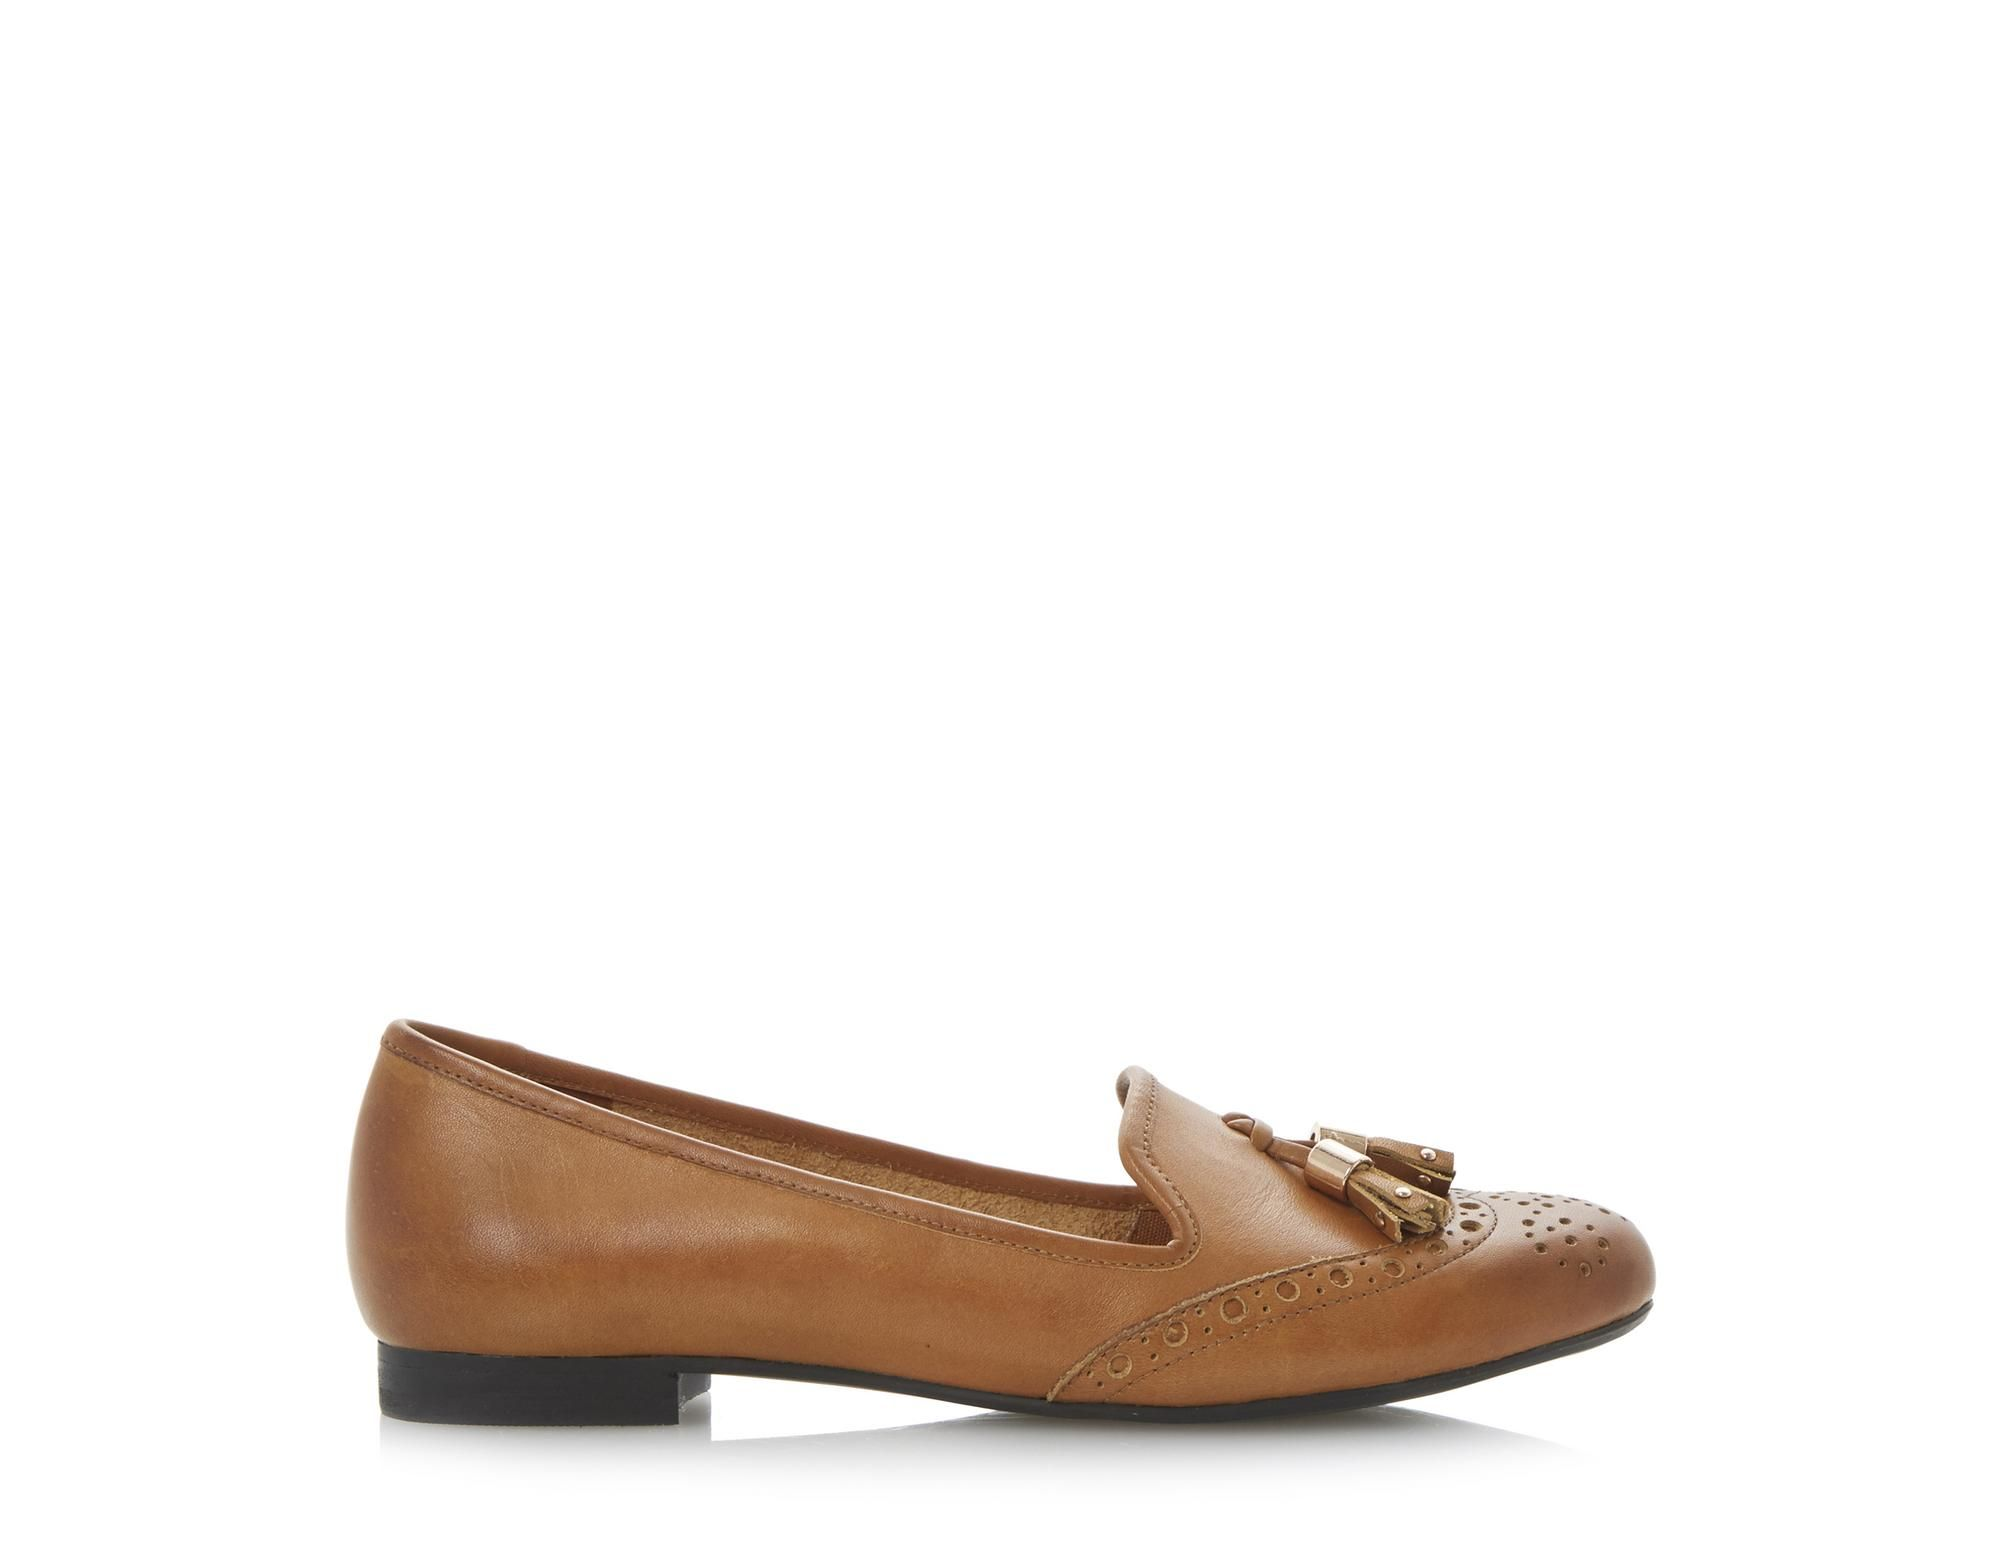 ee0209009e2 DUNE LADIES LOKI - Brogue Tassel Detail Loafer - tan